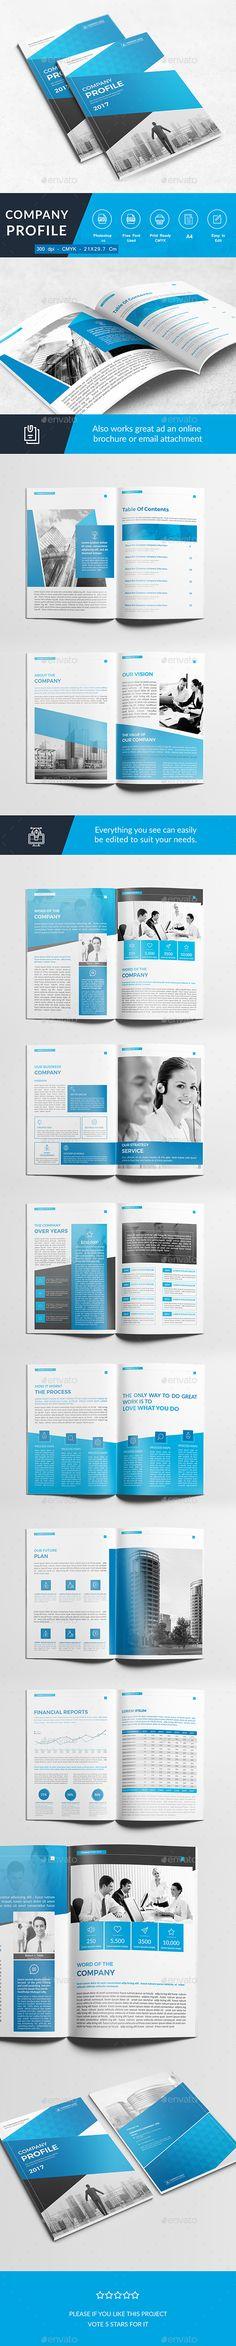 Company Profile - Corporate Brochures | Download: https://graphicriver.net/item/company-profile/18673081?ref=sinzo